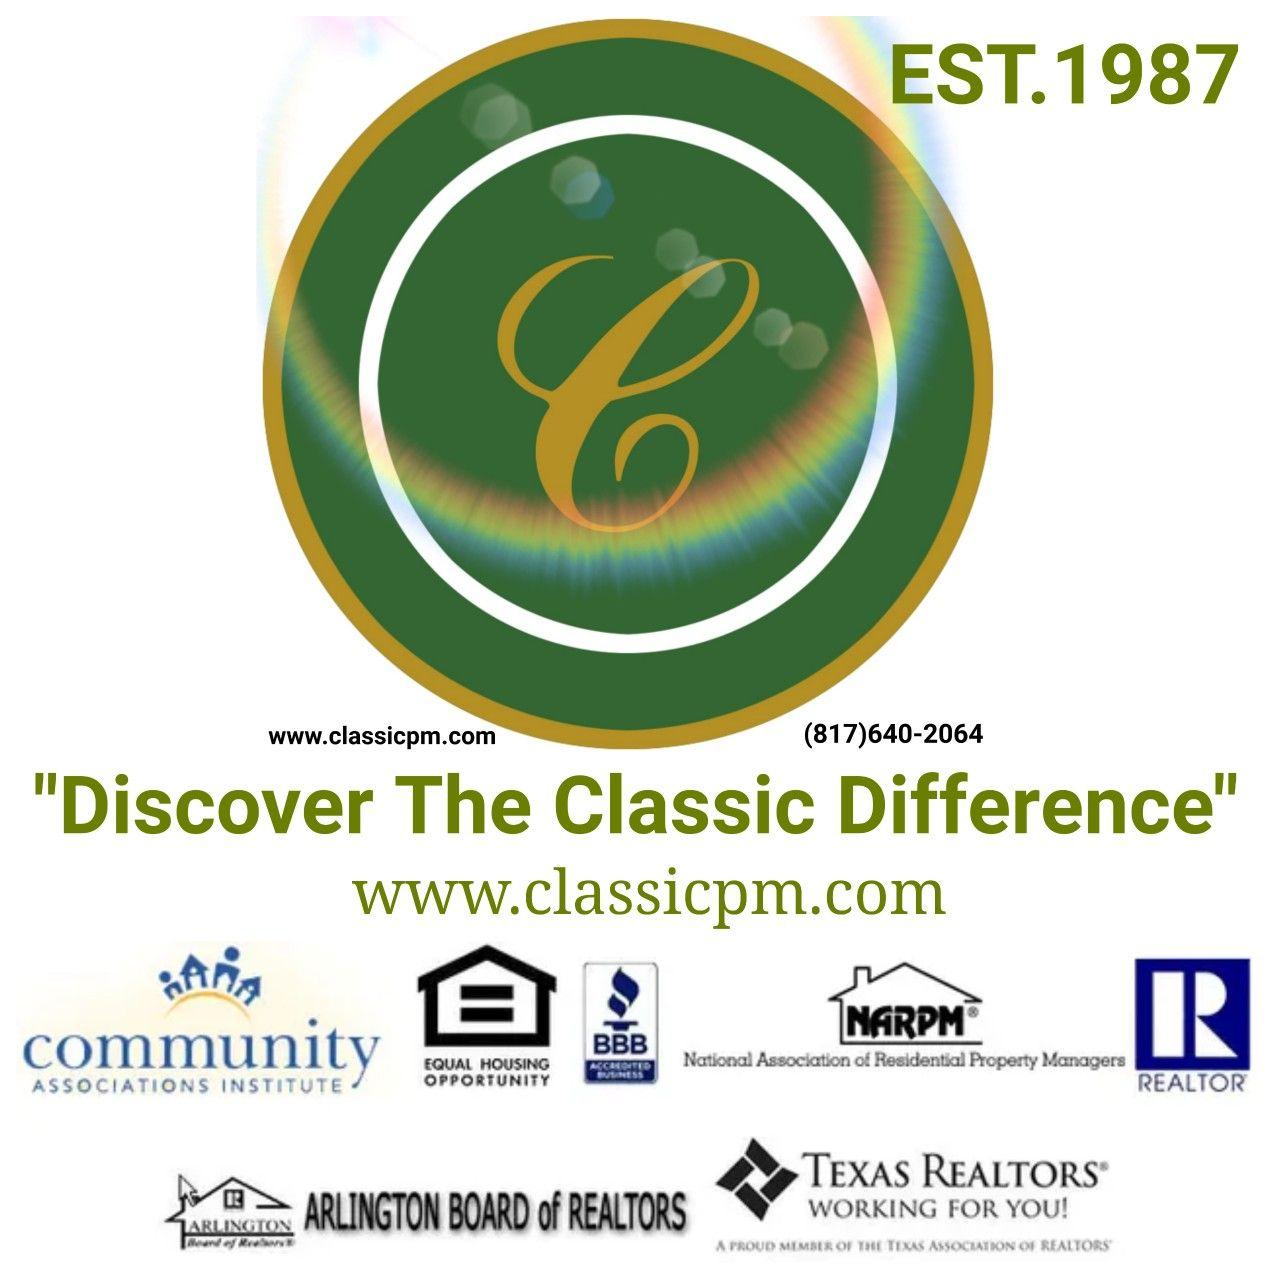 Classic Property Management Aamc Classic Real Estate Services In 2020 Property Management Management Association Management